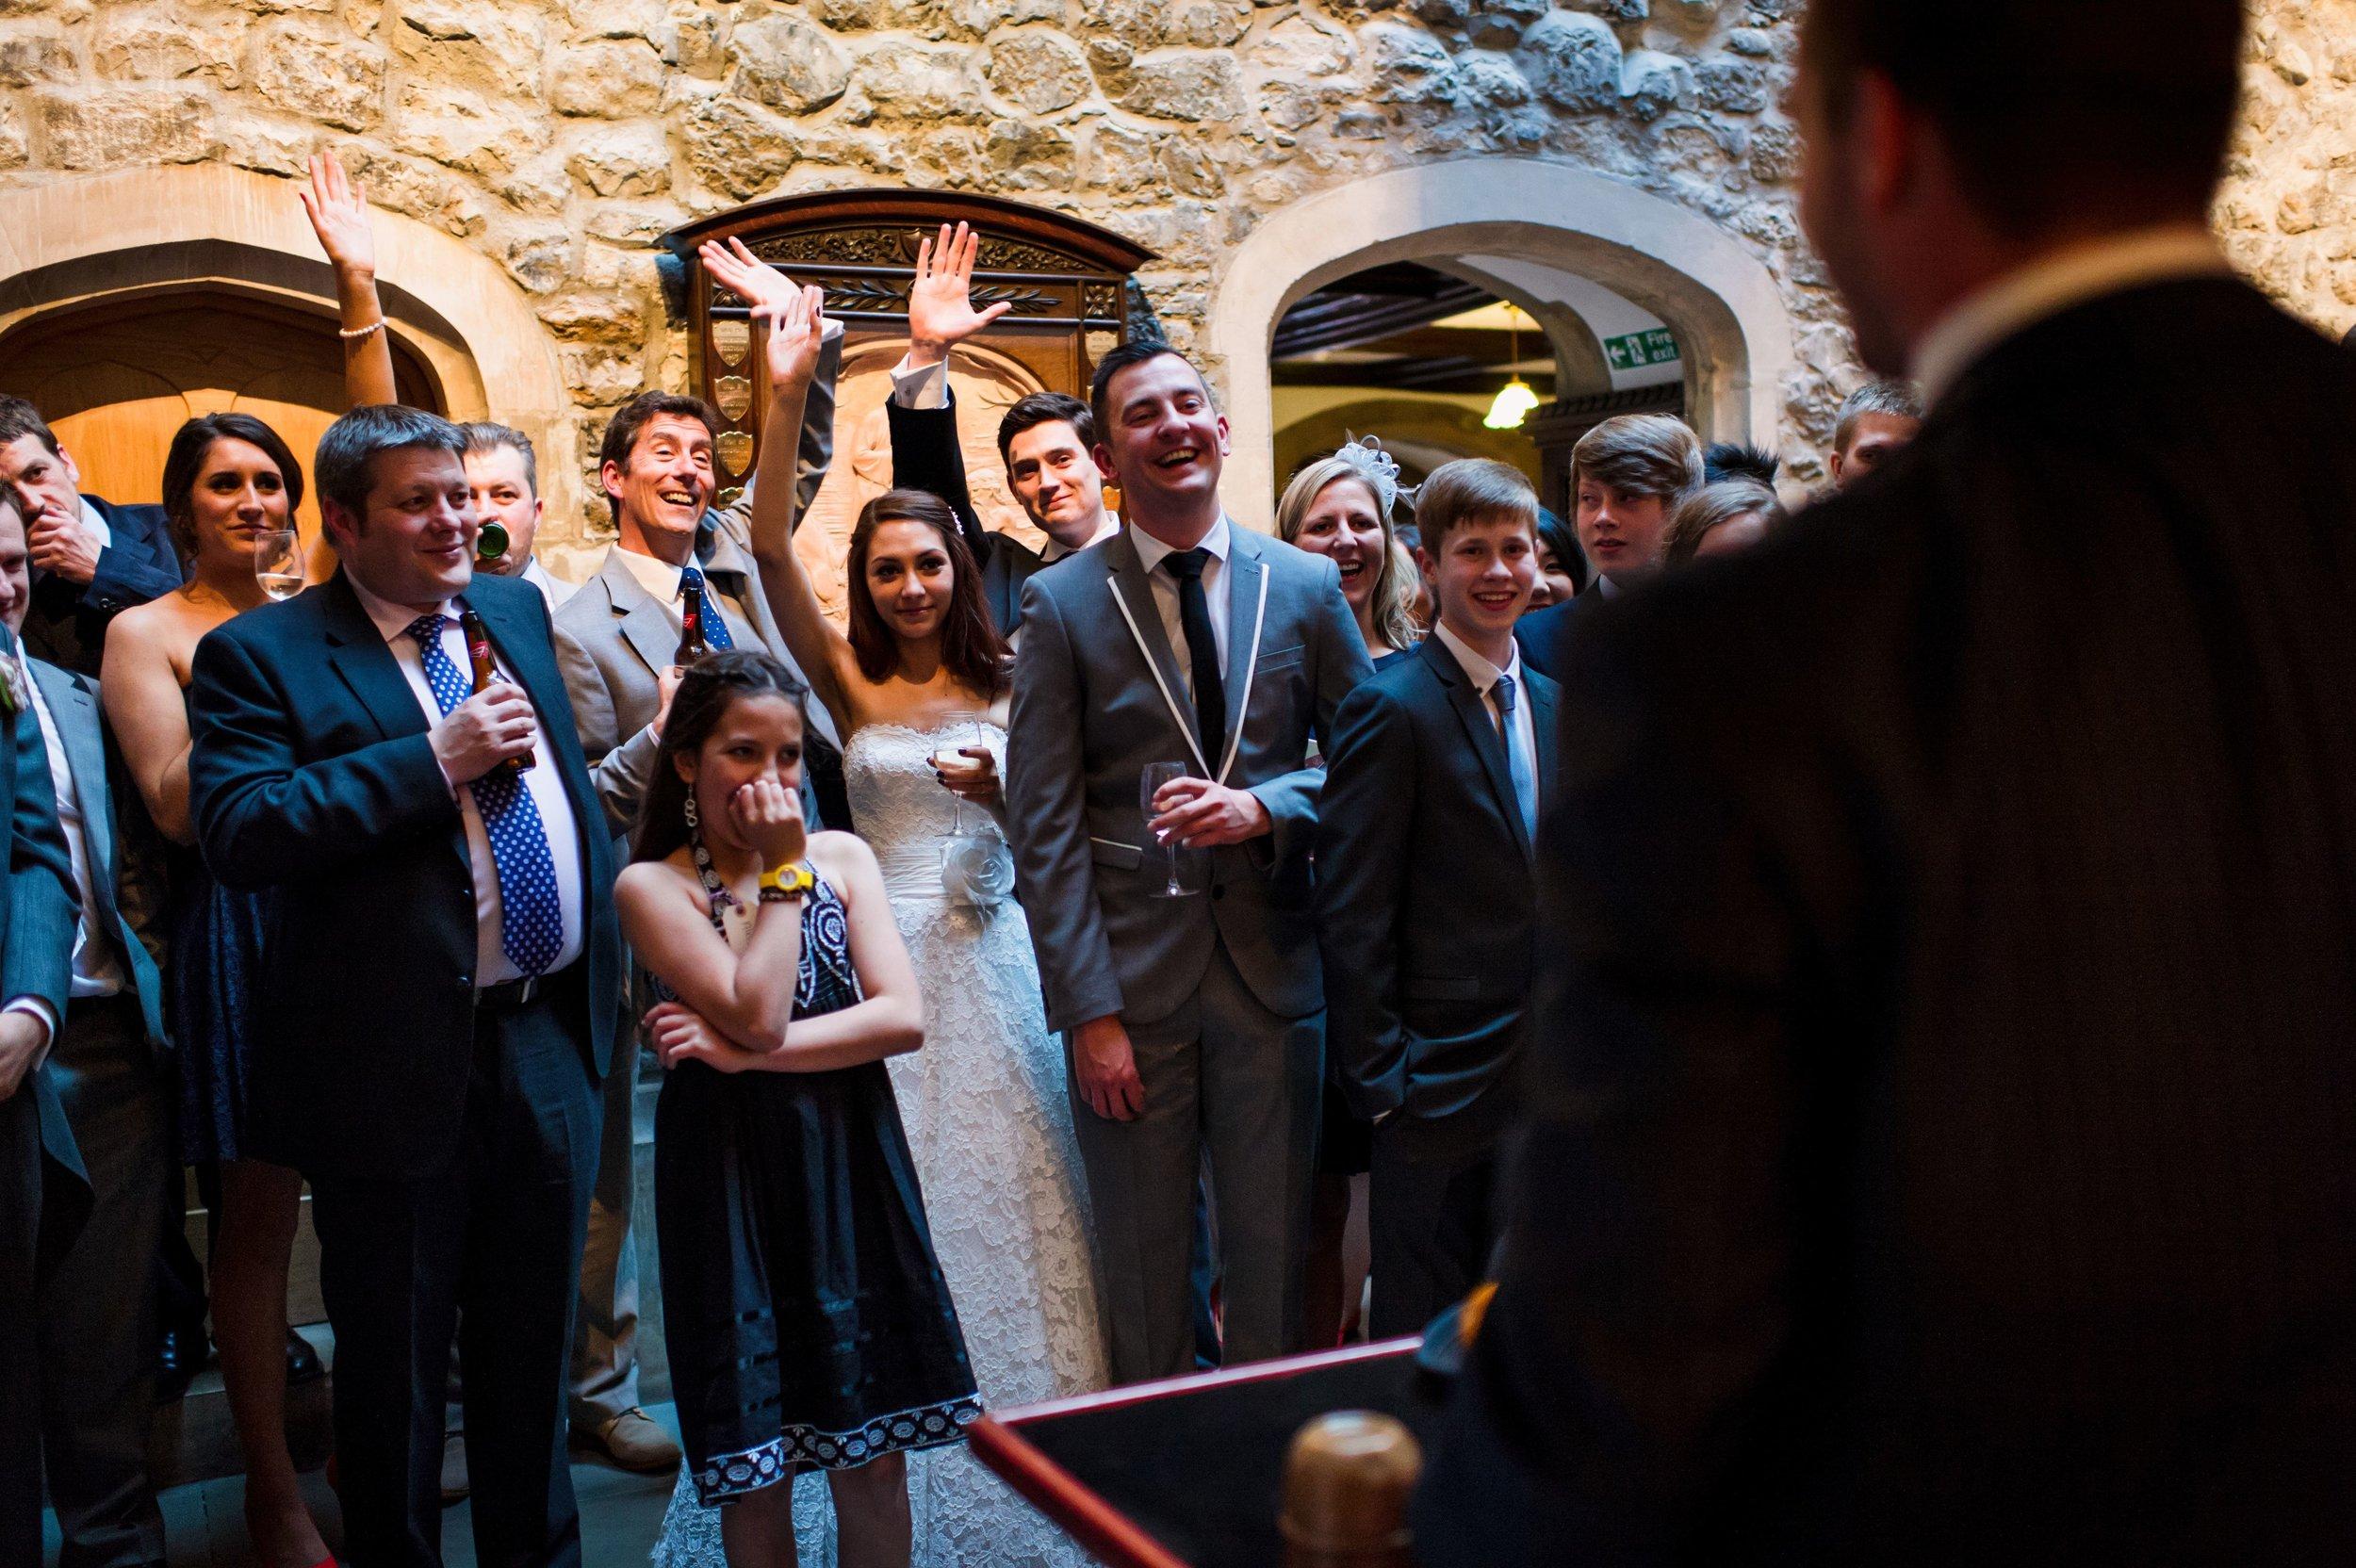 wedding magician Nick Stein entertaining at wedding .jpg